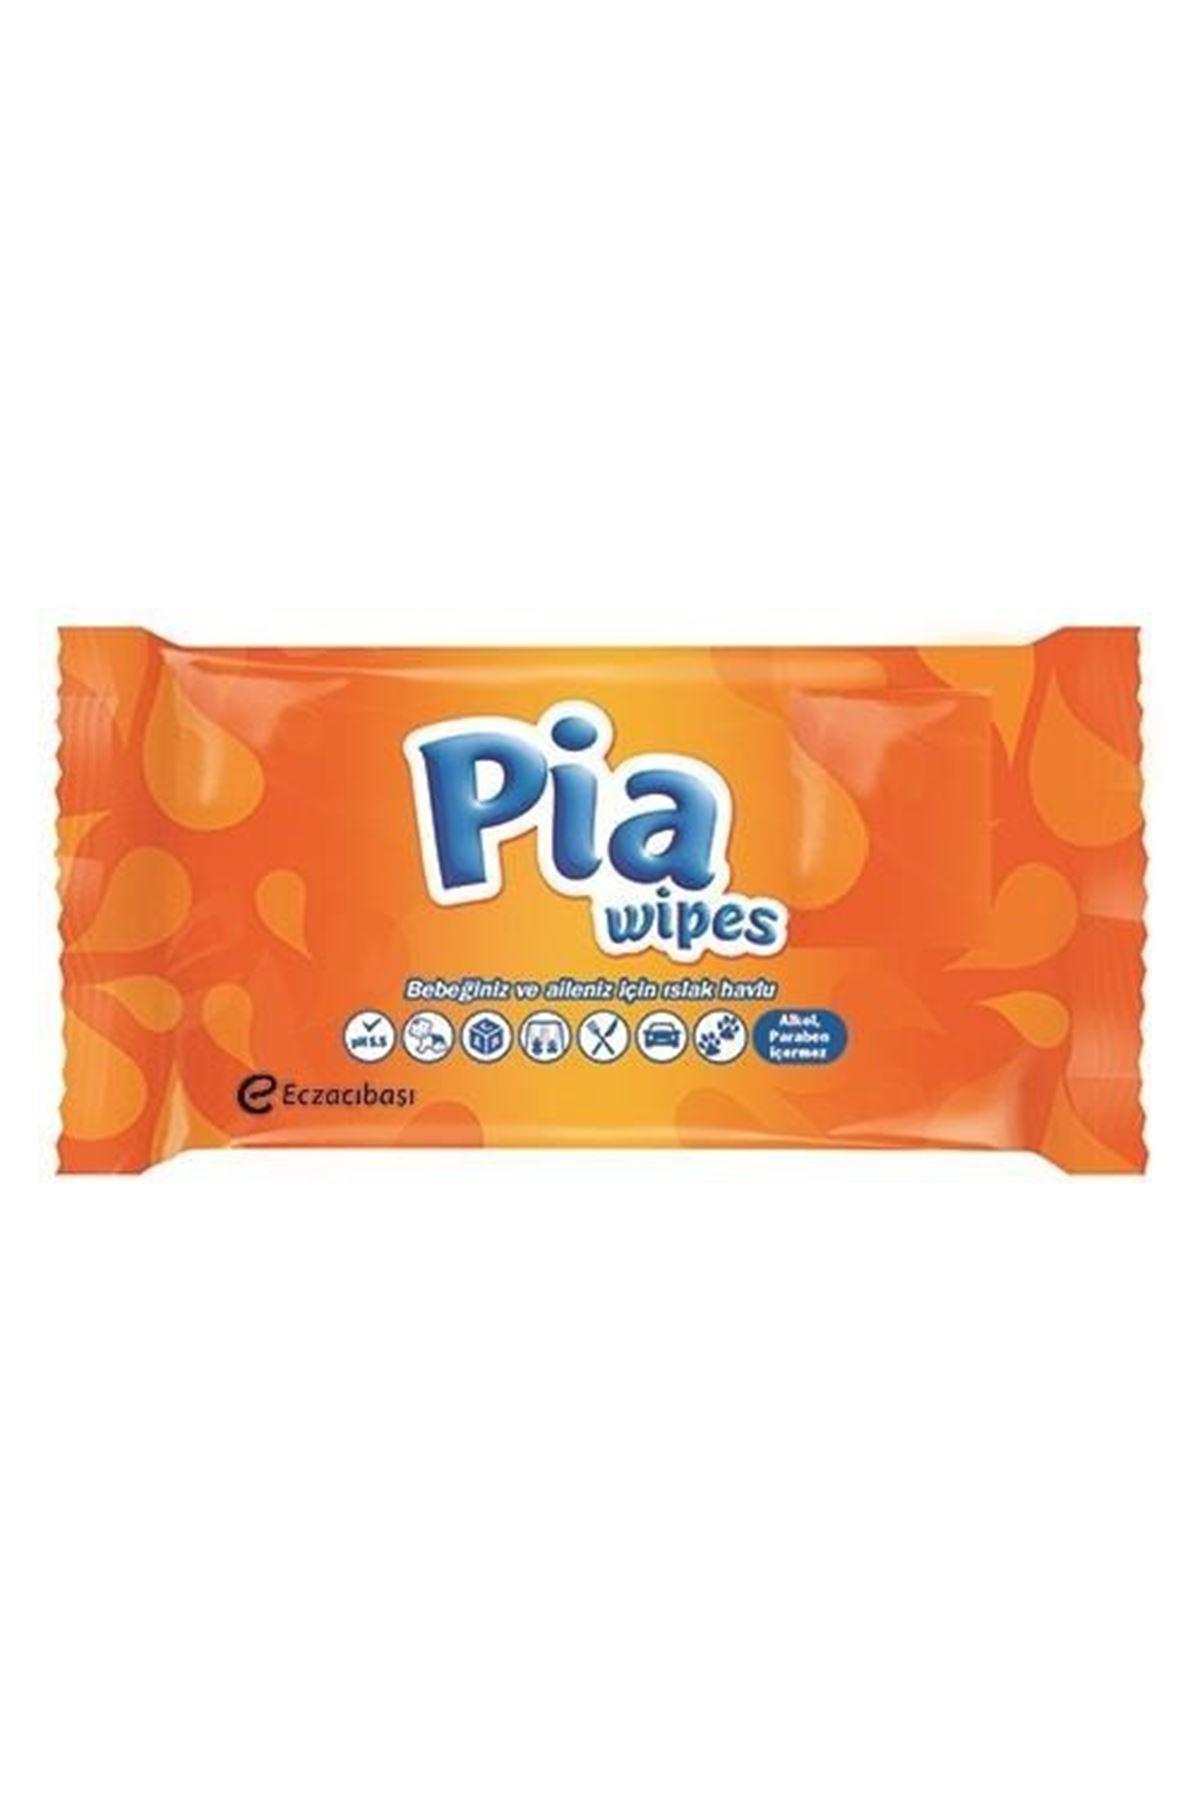 Pia  Wipes 60 adet Islak Havlu / Eczacıbaşı